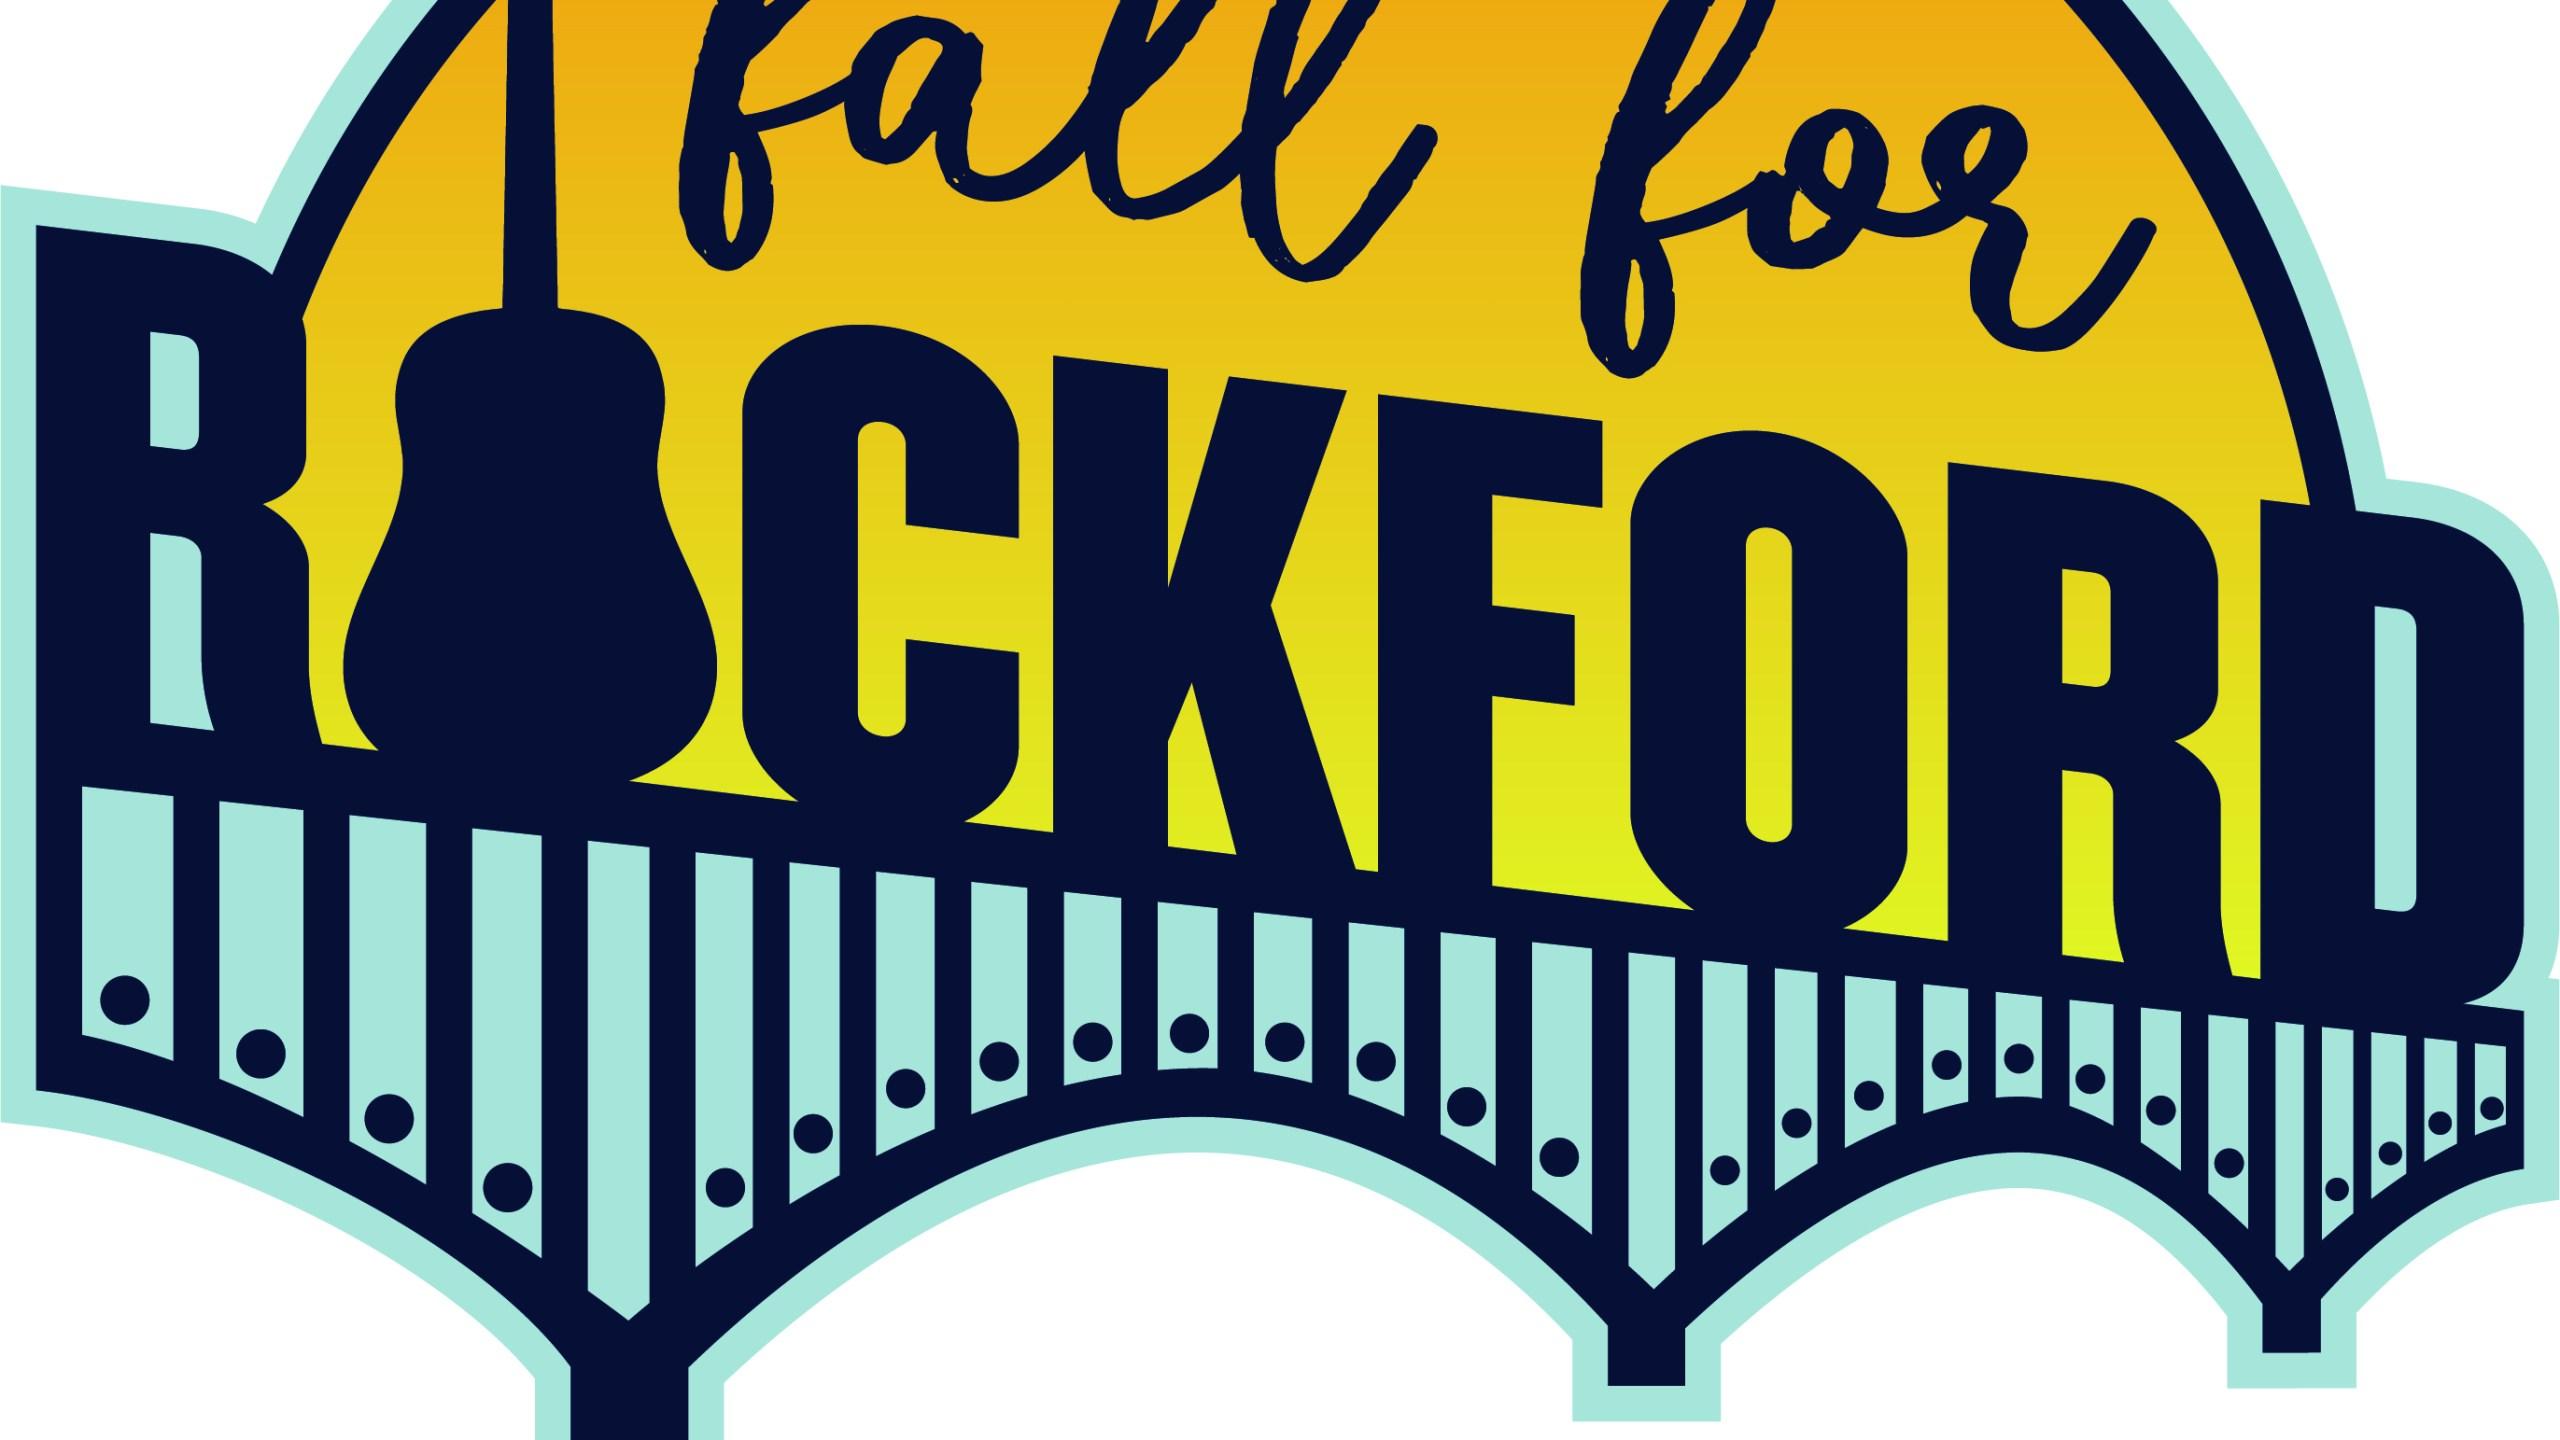 fall for rockford logo_1535559433415.jpg.jpg